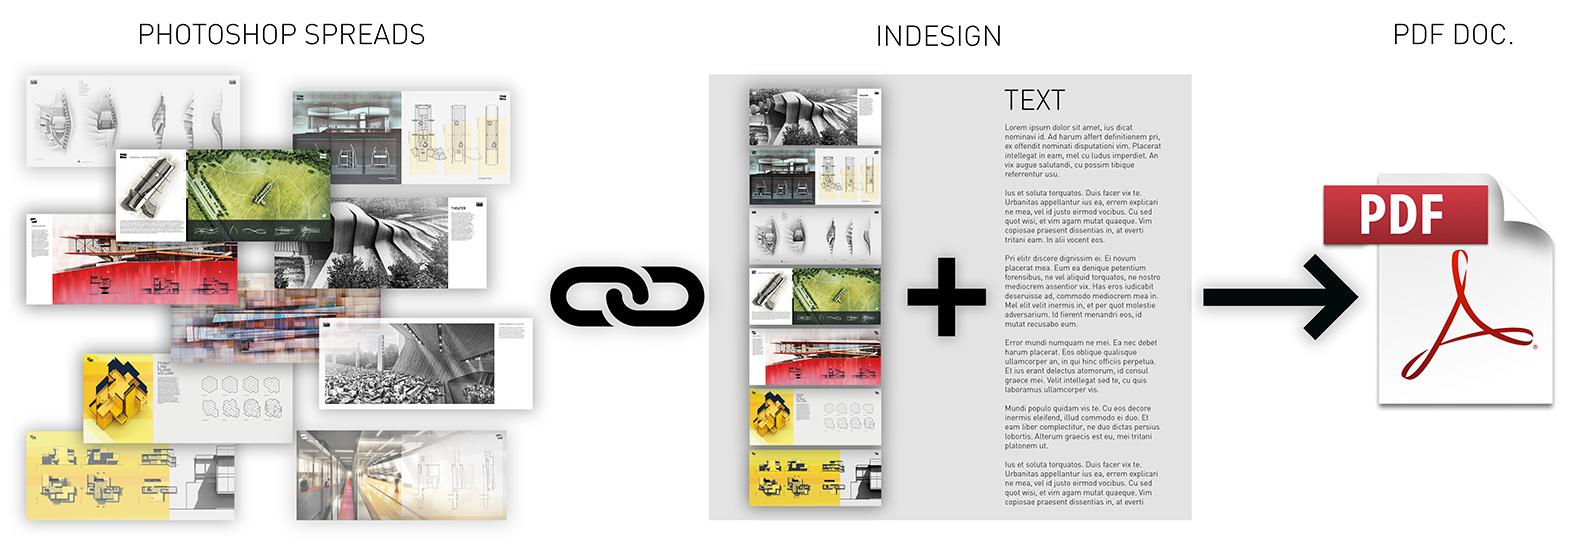 ps_indesign_workflow